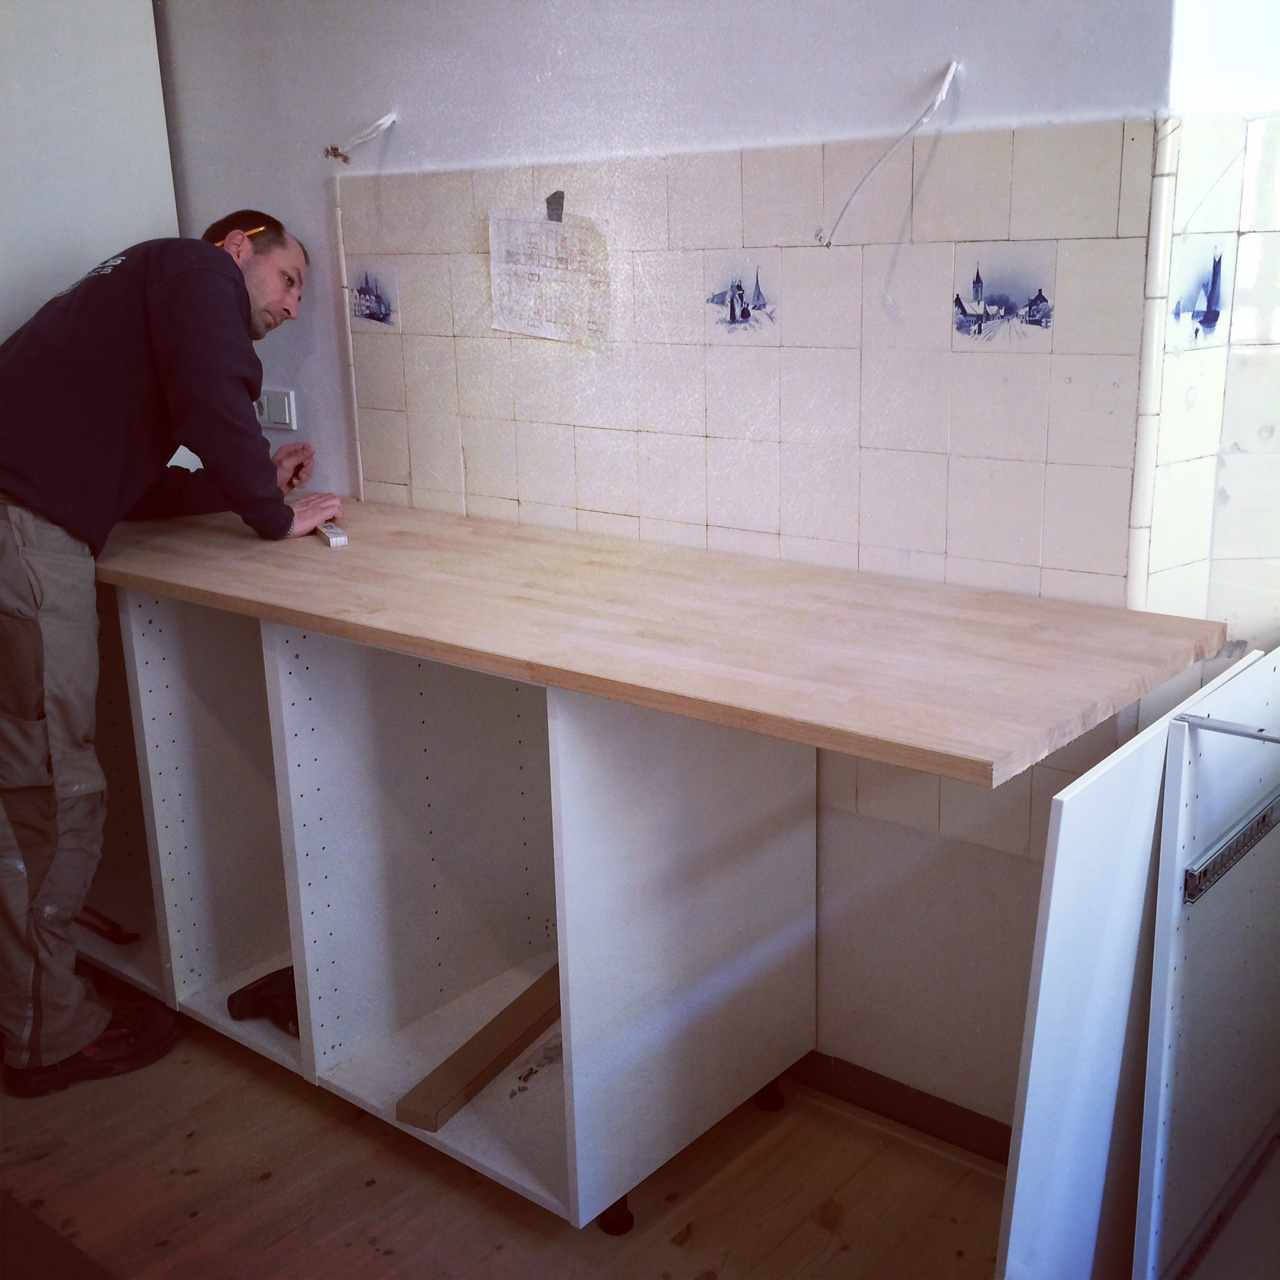 Uneven Kitchen Floor Our New Kitchen The Wednesday Chef